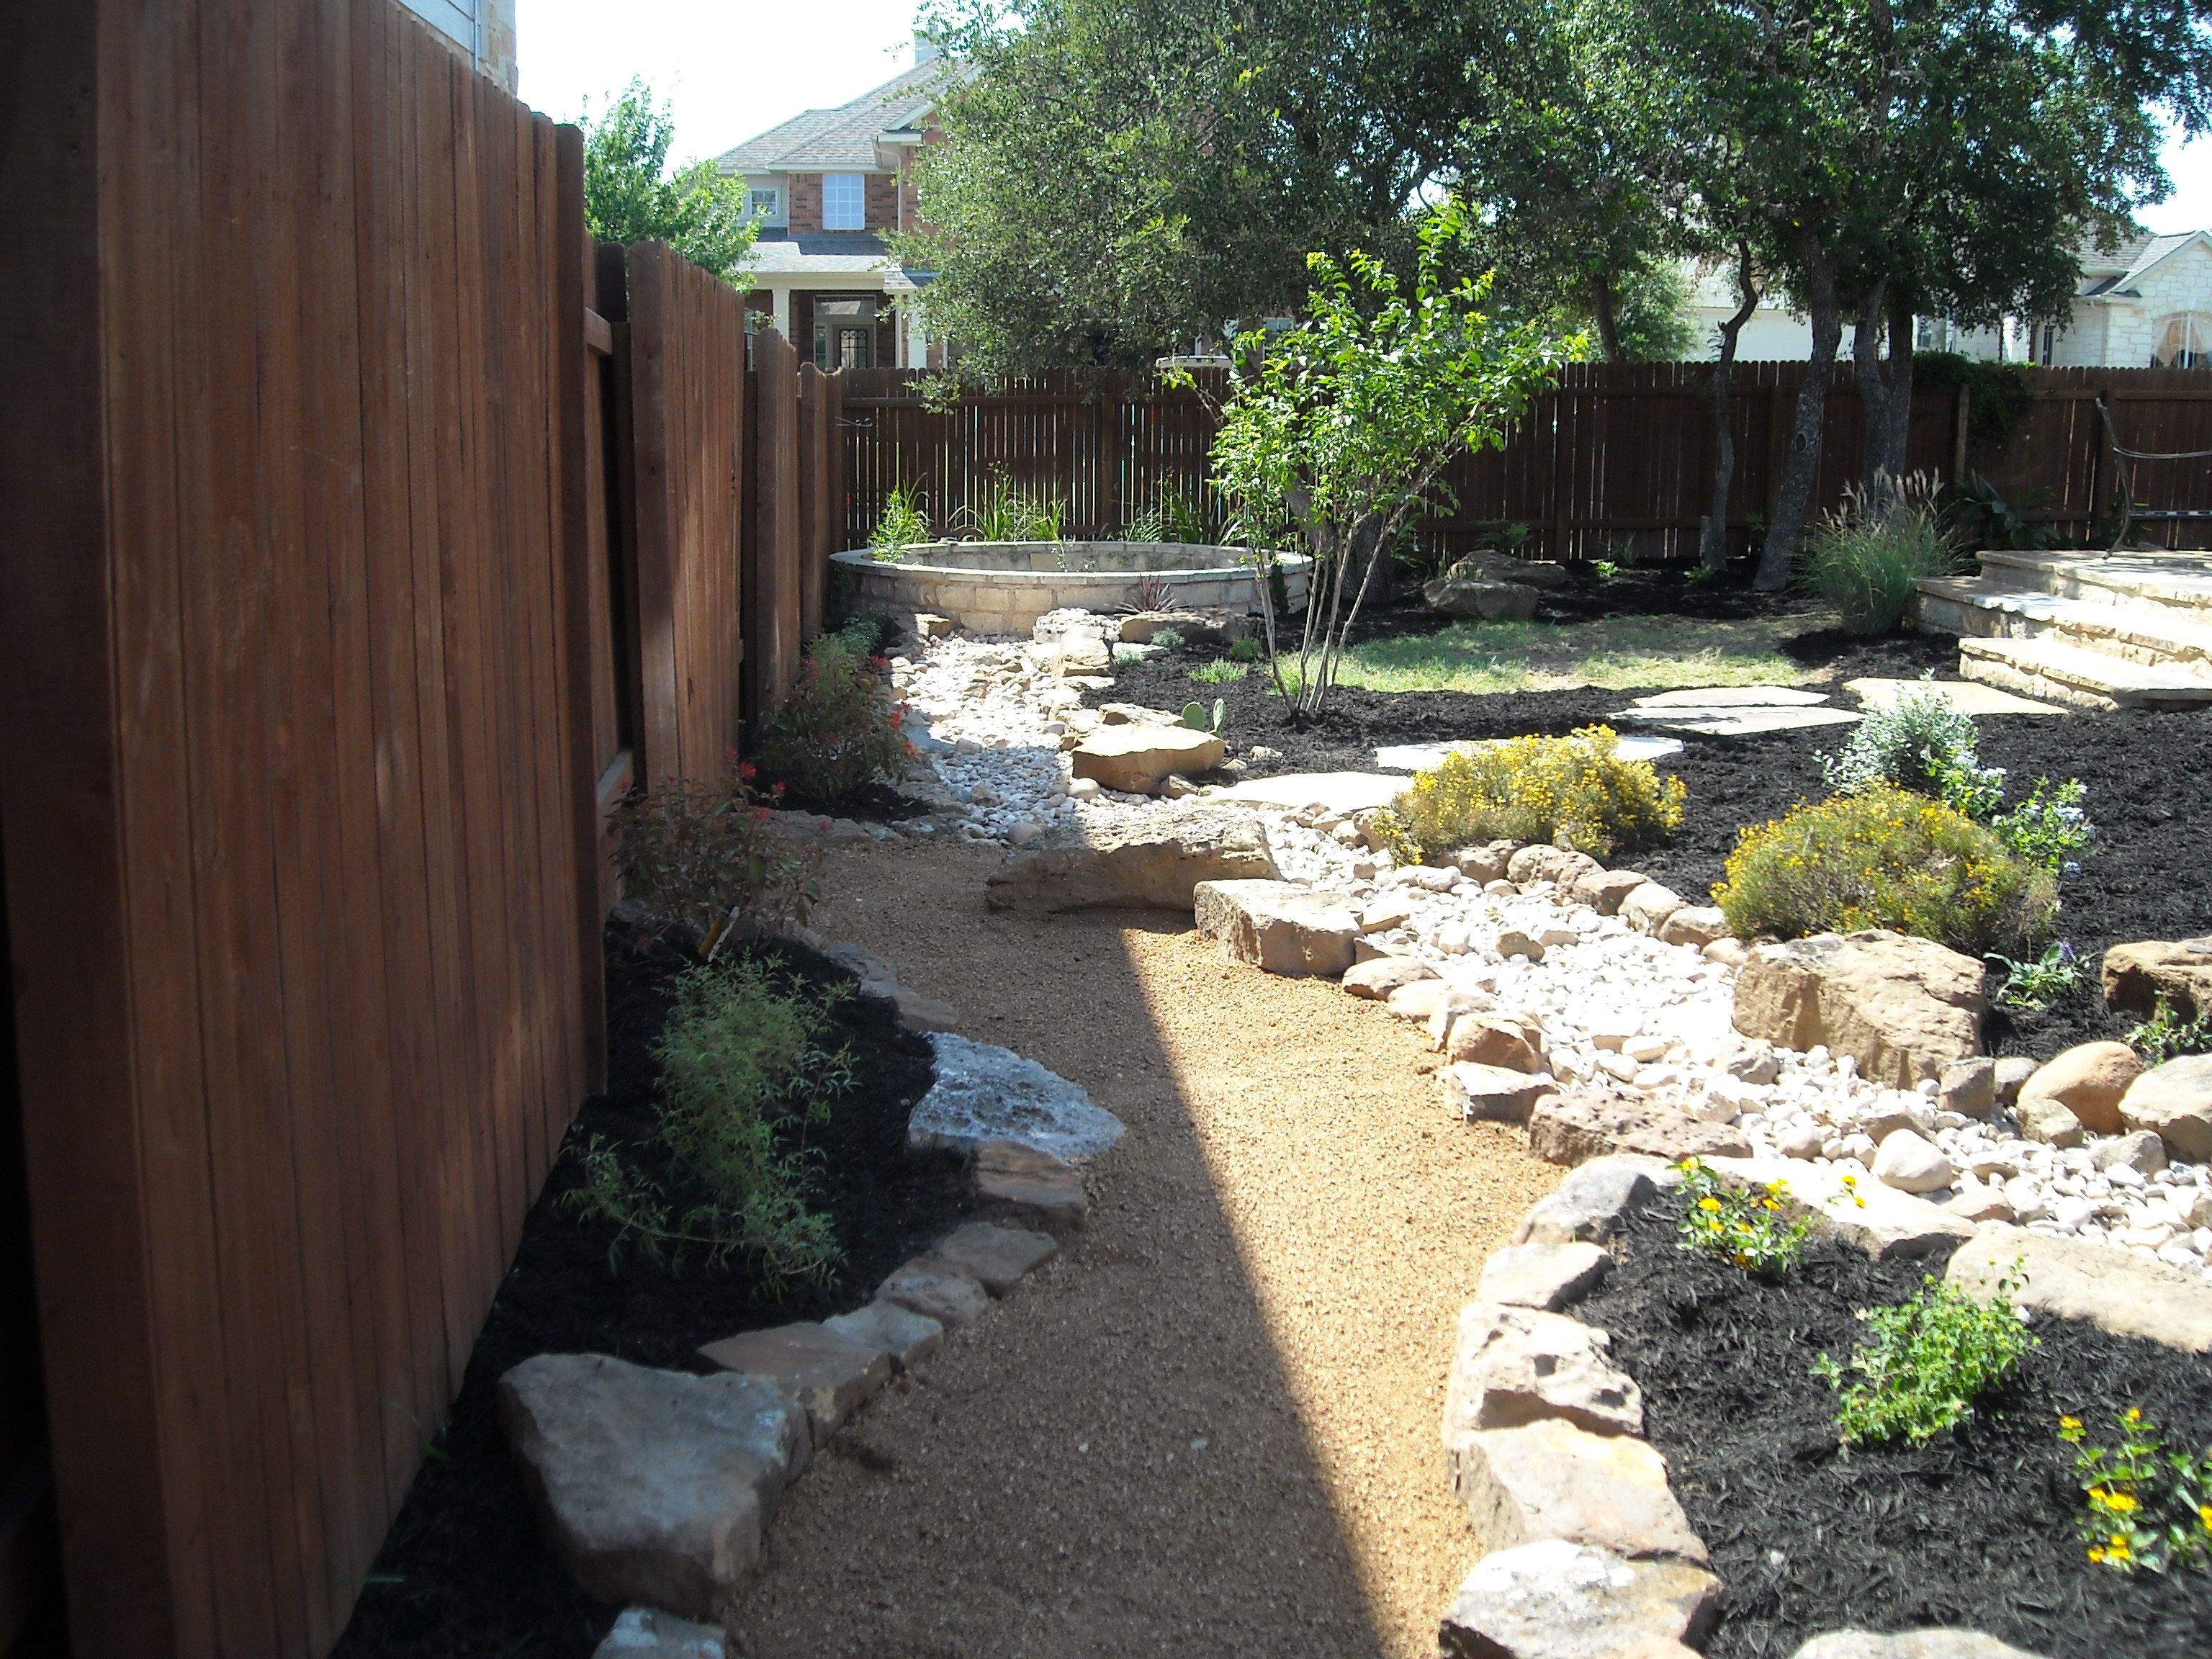 backyard landscape design using all my favorite elements on backyard landscape architecture inspirations id=55089